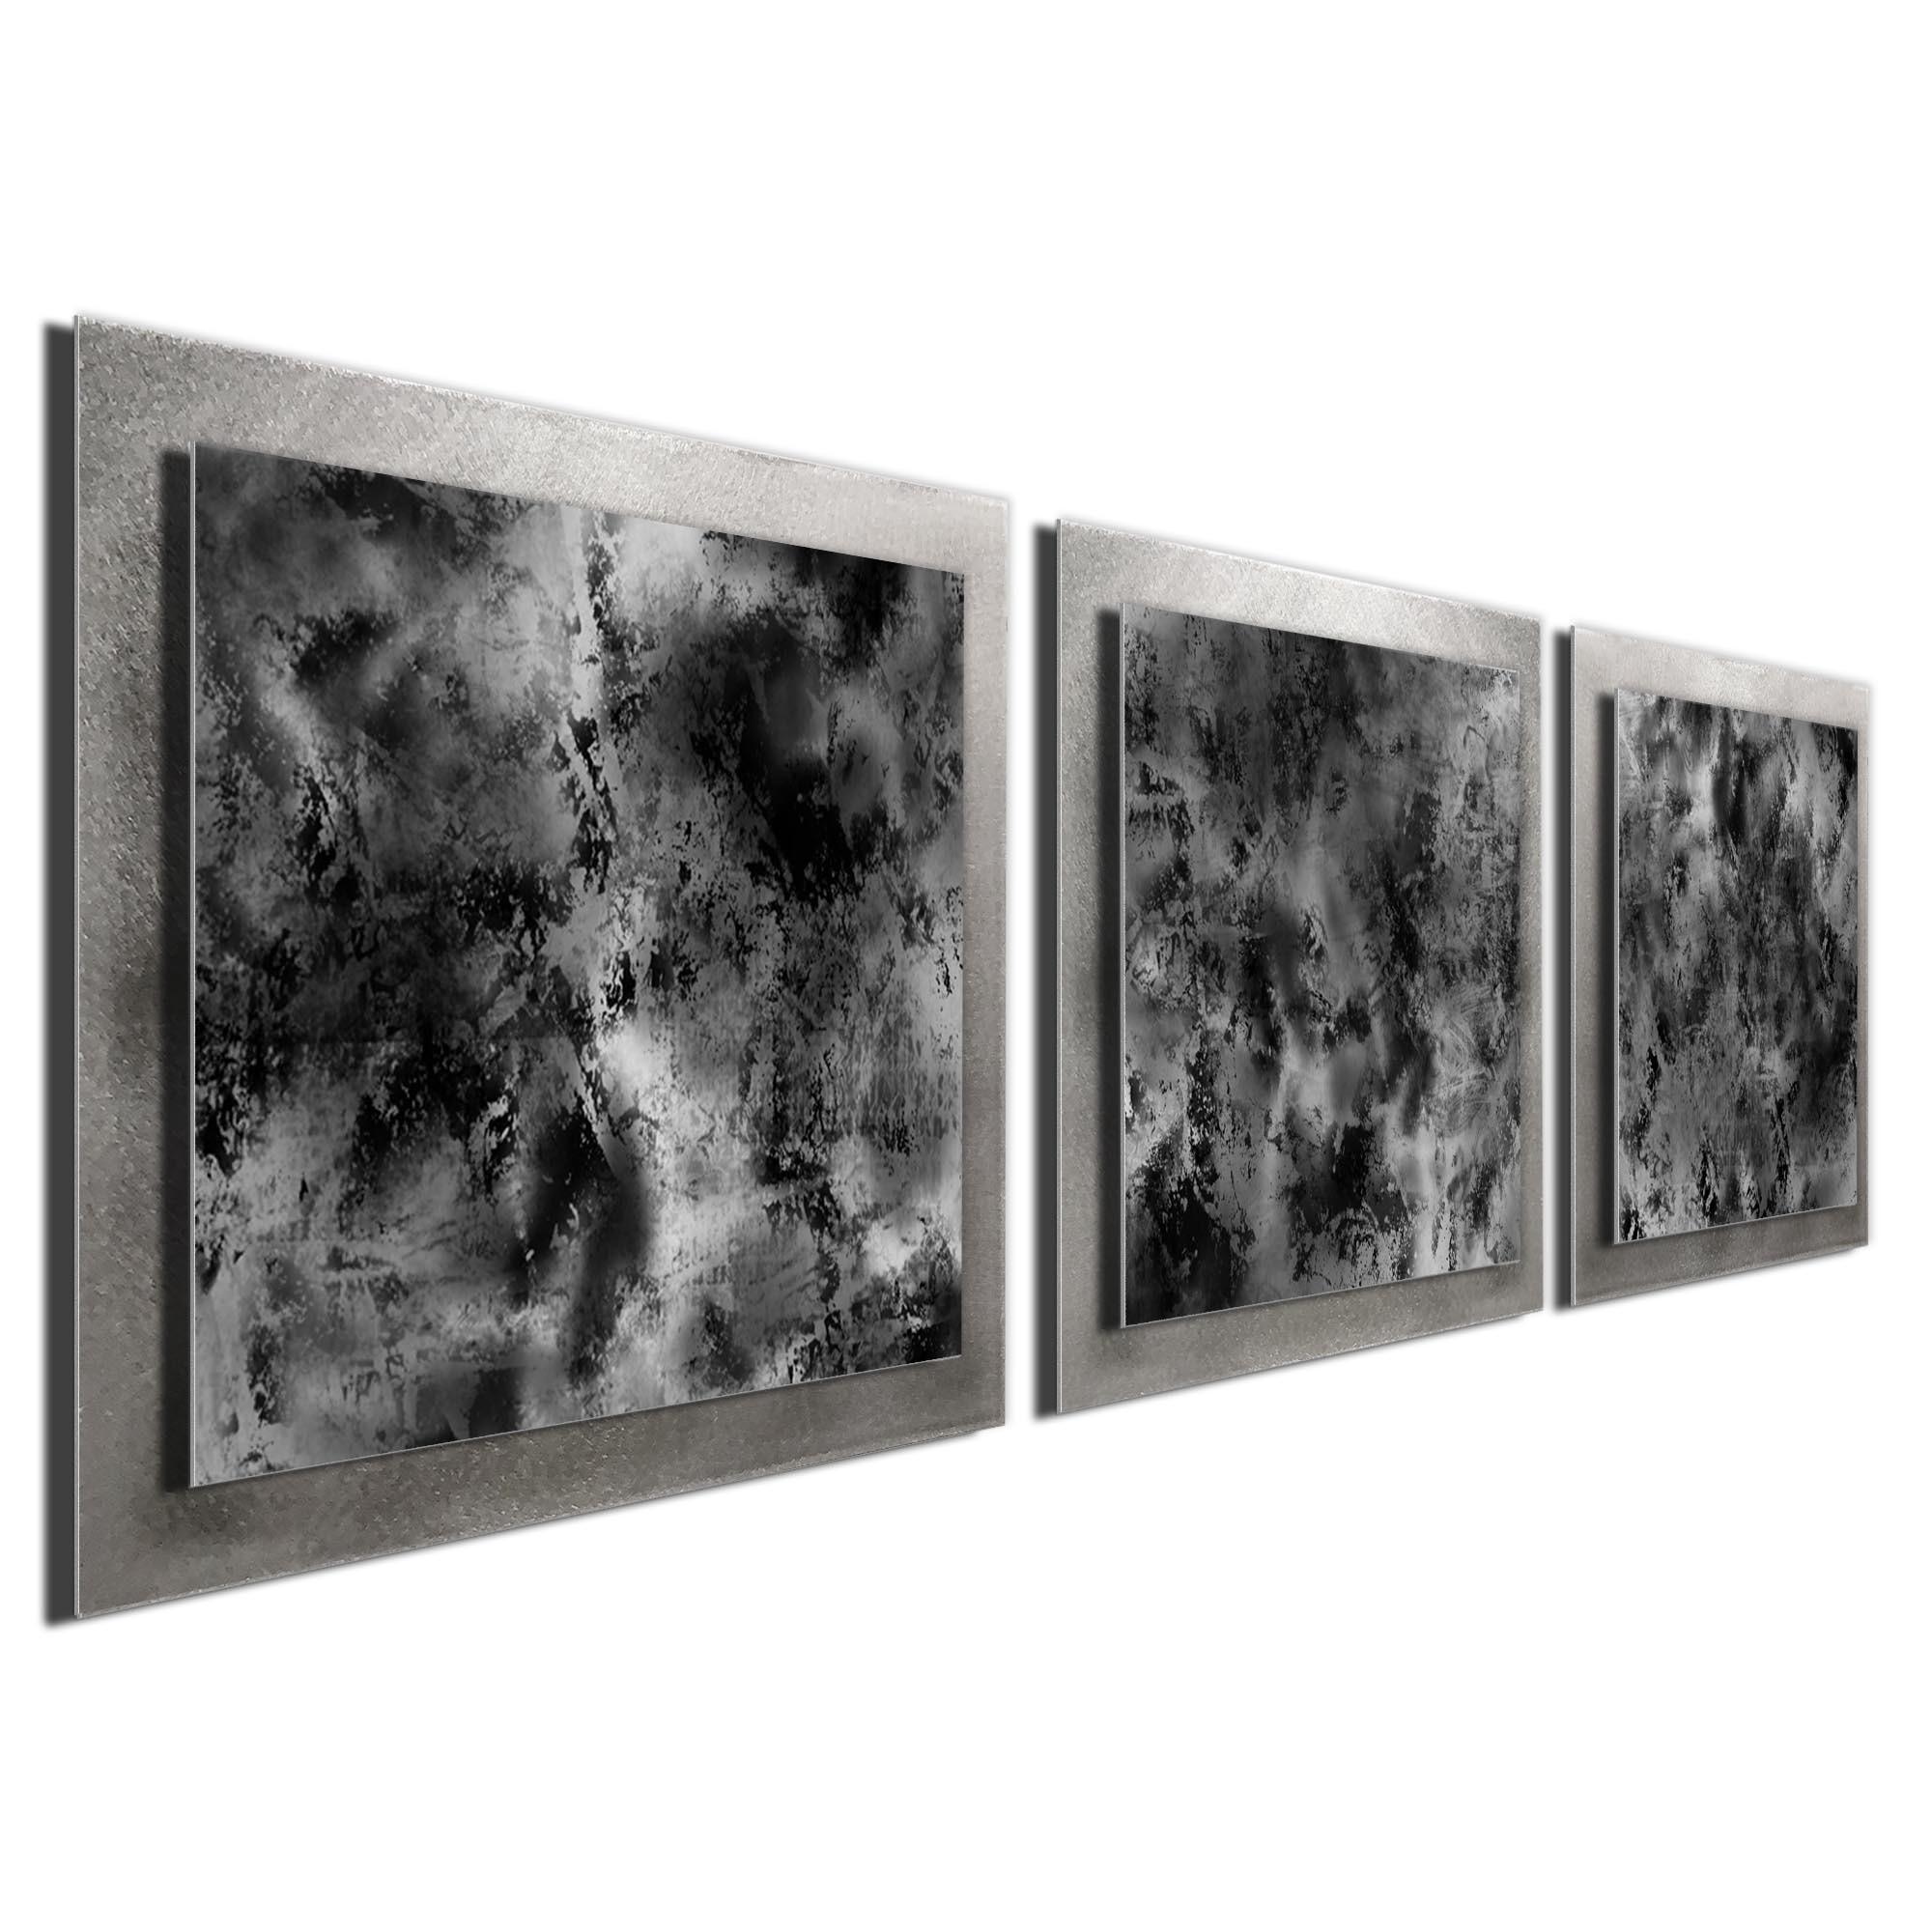 Minimalist Metal Wall Art \'Slate Essence\' - 38x12 in. - Contemporary Urban Decor - Black/Grey/White Masculine Art (1)